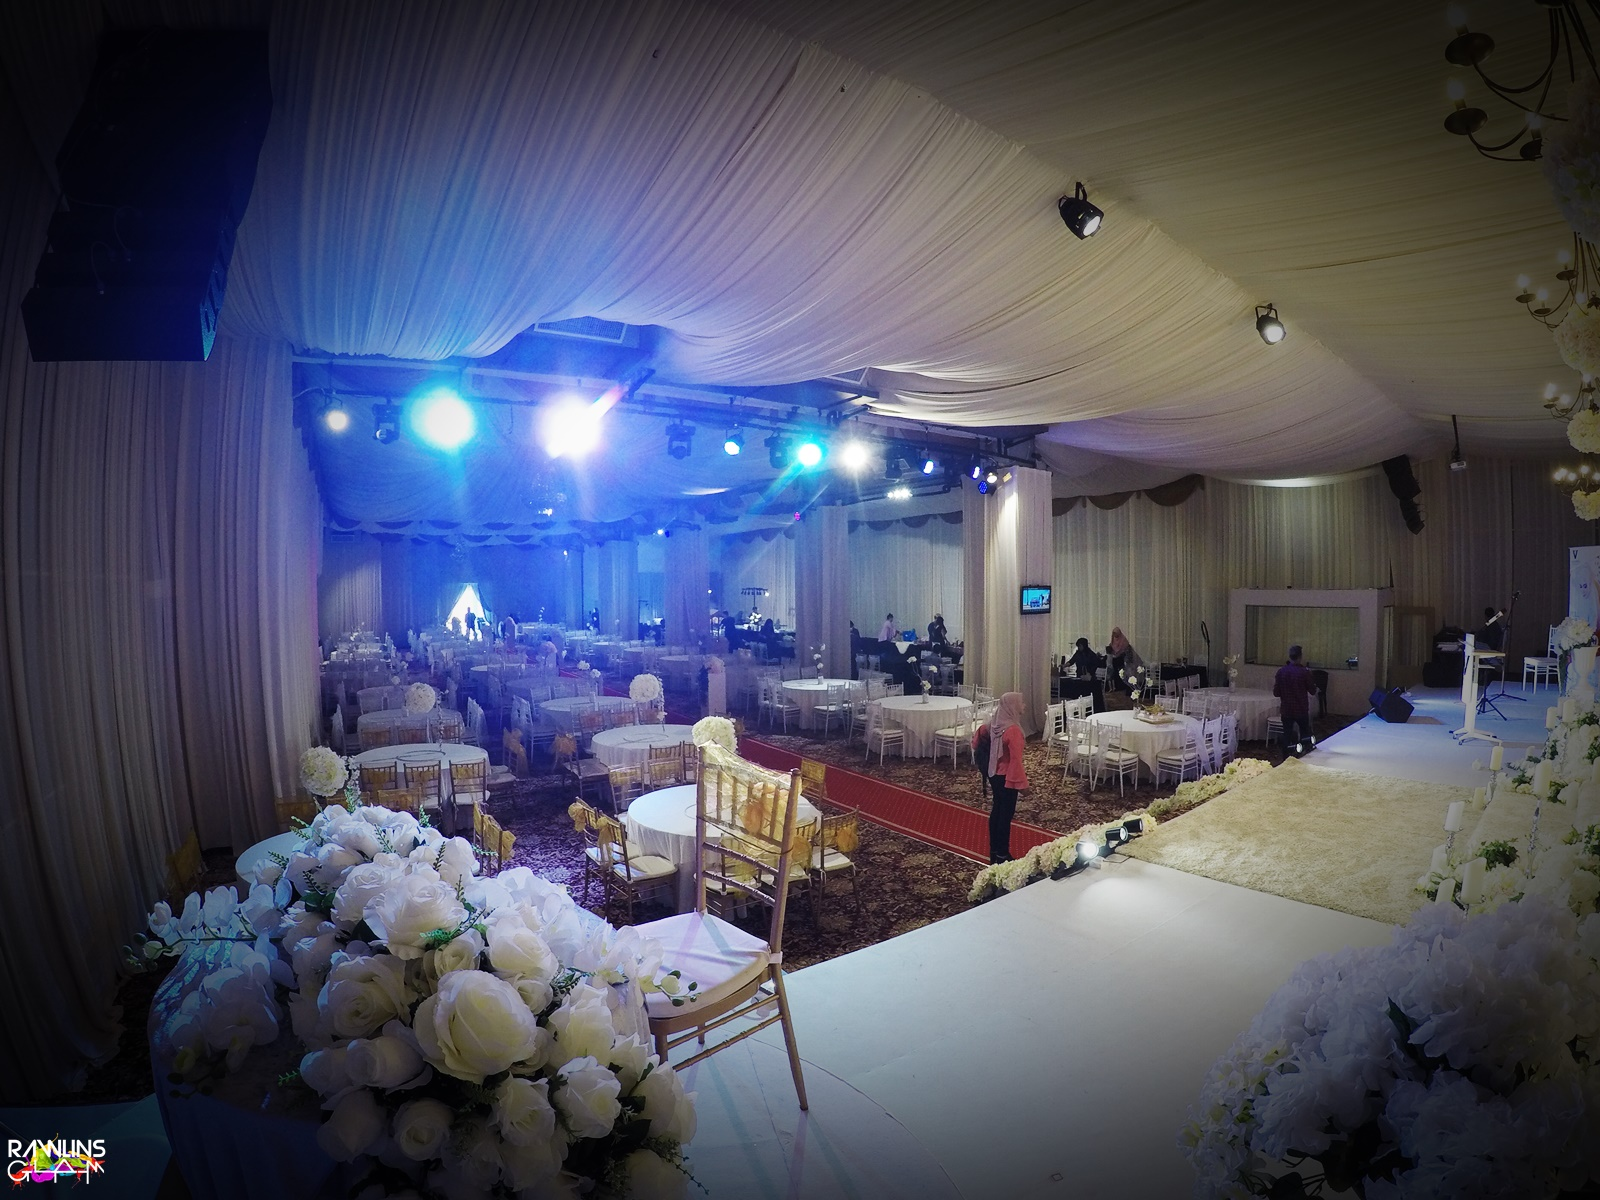 The Venue, The Venue Shah Alam, Pakej Perkahwinan murah, dewan murah di Shah Alam, wedding packages, Raja Sehari, busana pengantin, Rawlins GLAM